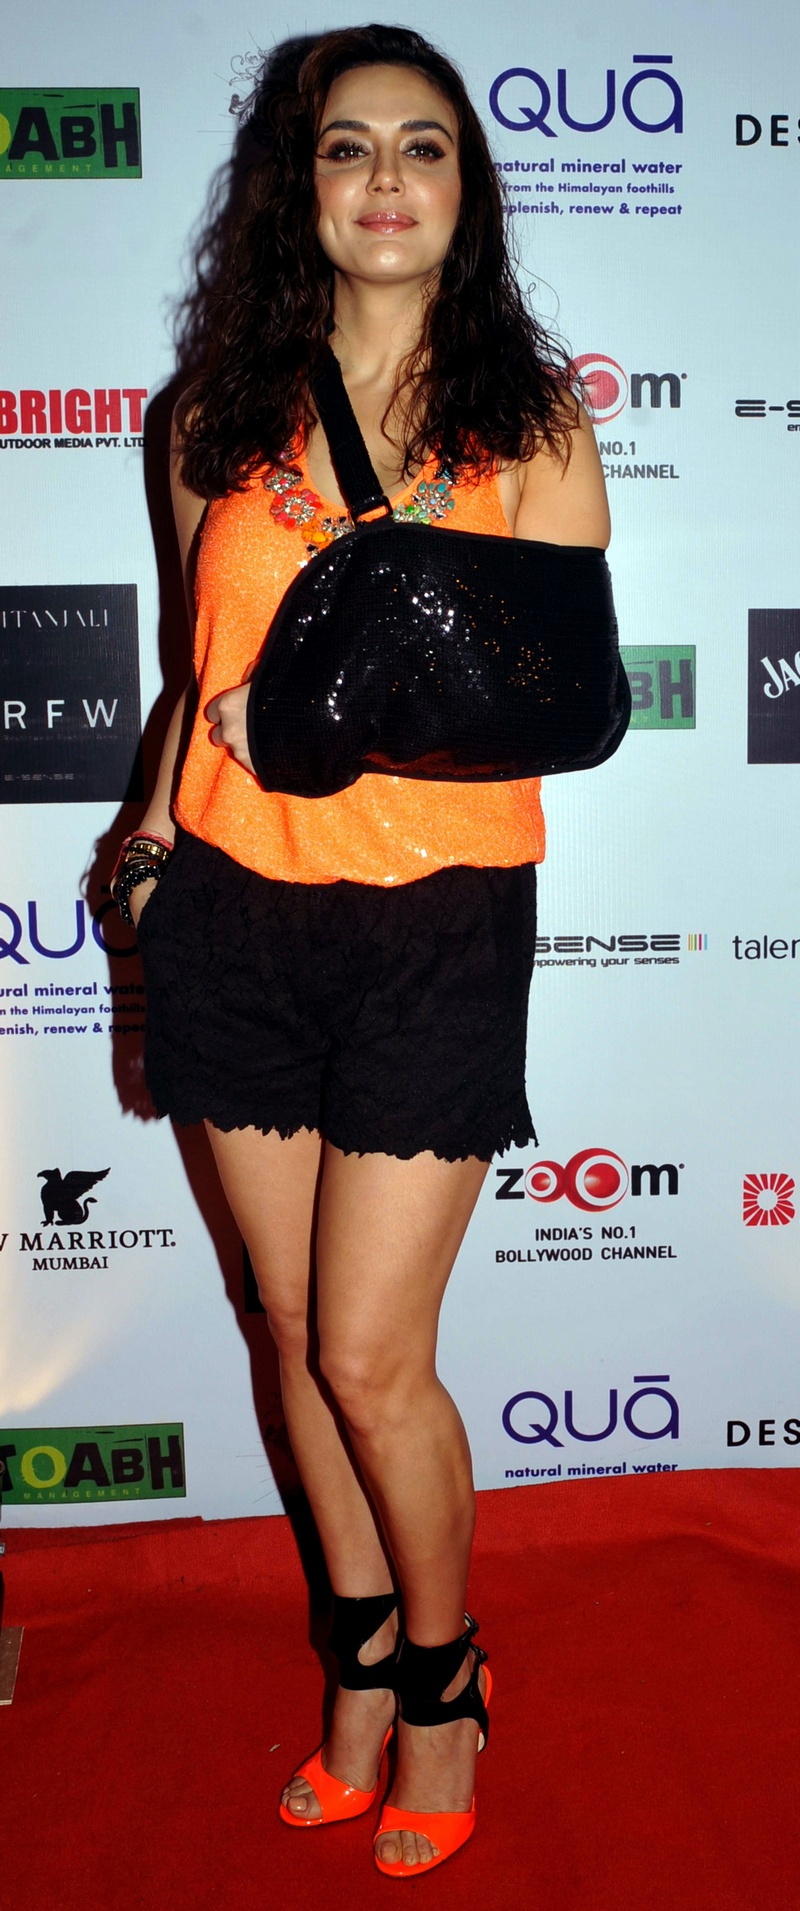 Injured Preity Zinta